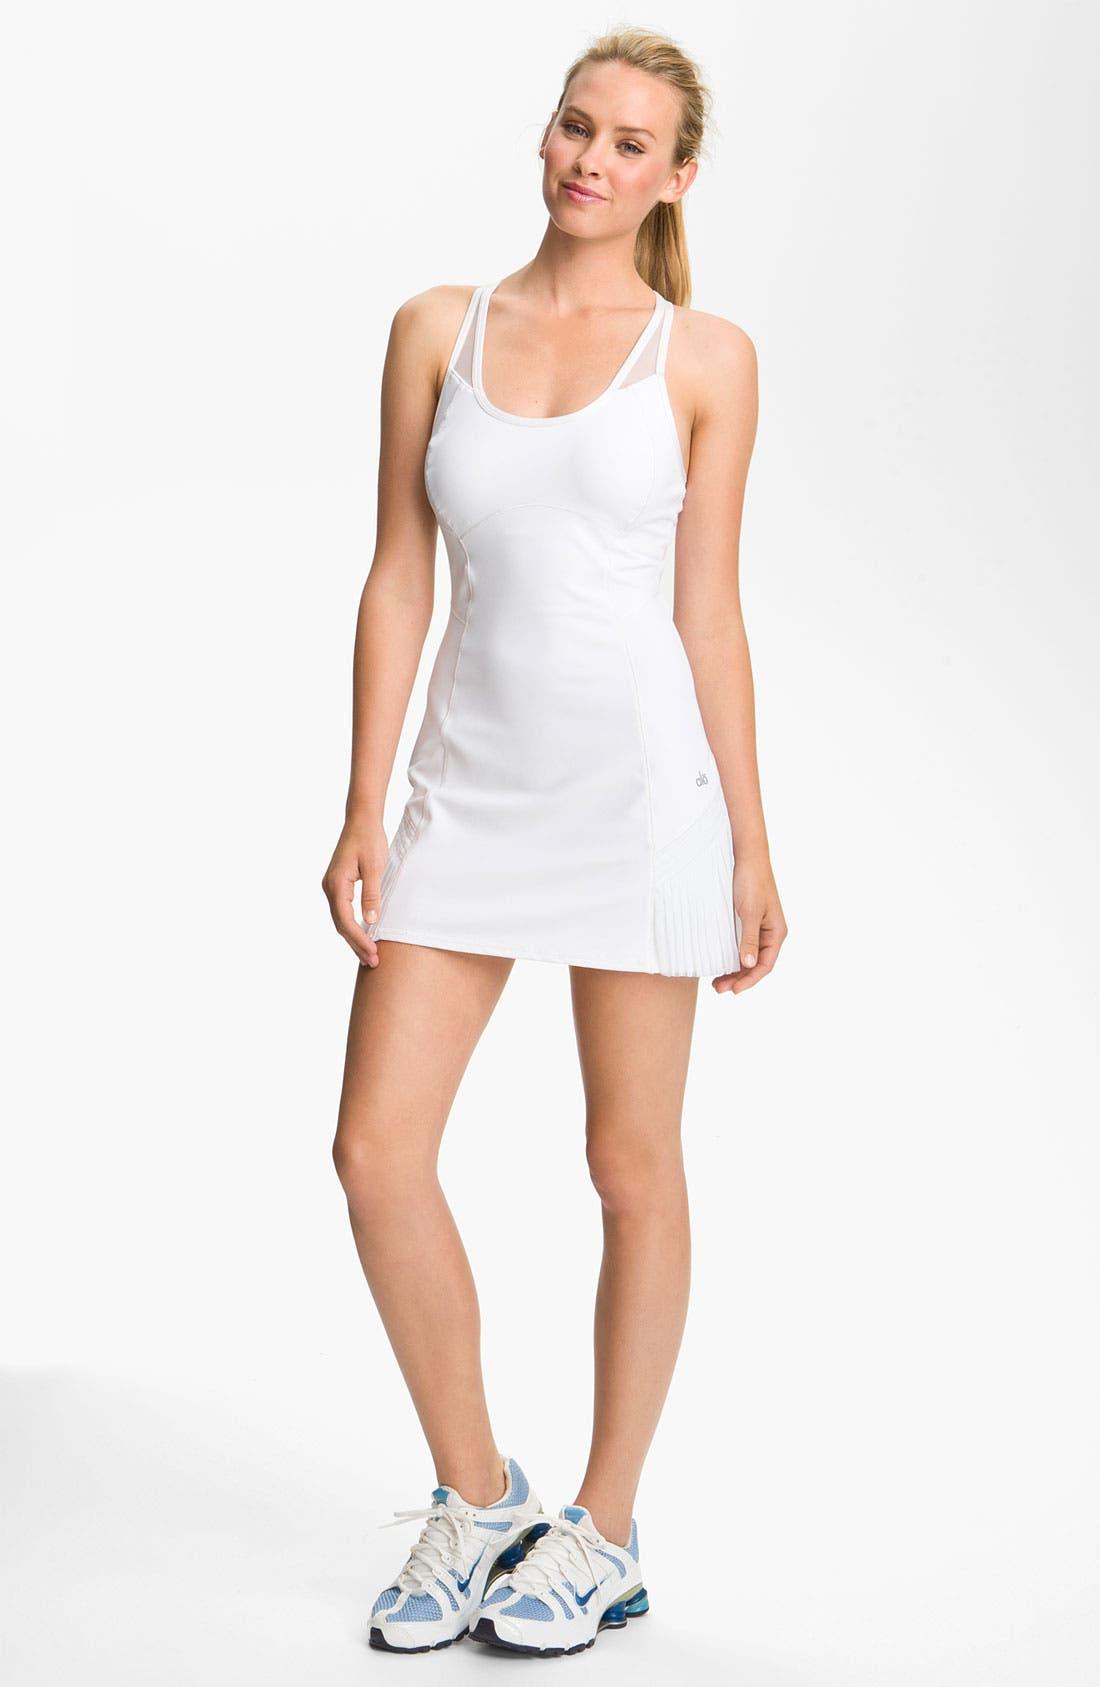 Alternate Image 1 Selected - Alo 'Best on Court' Dress